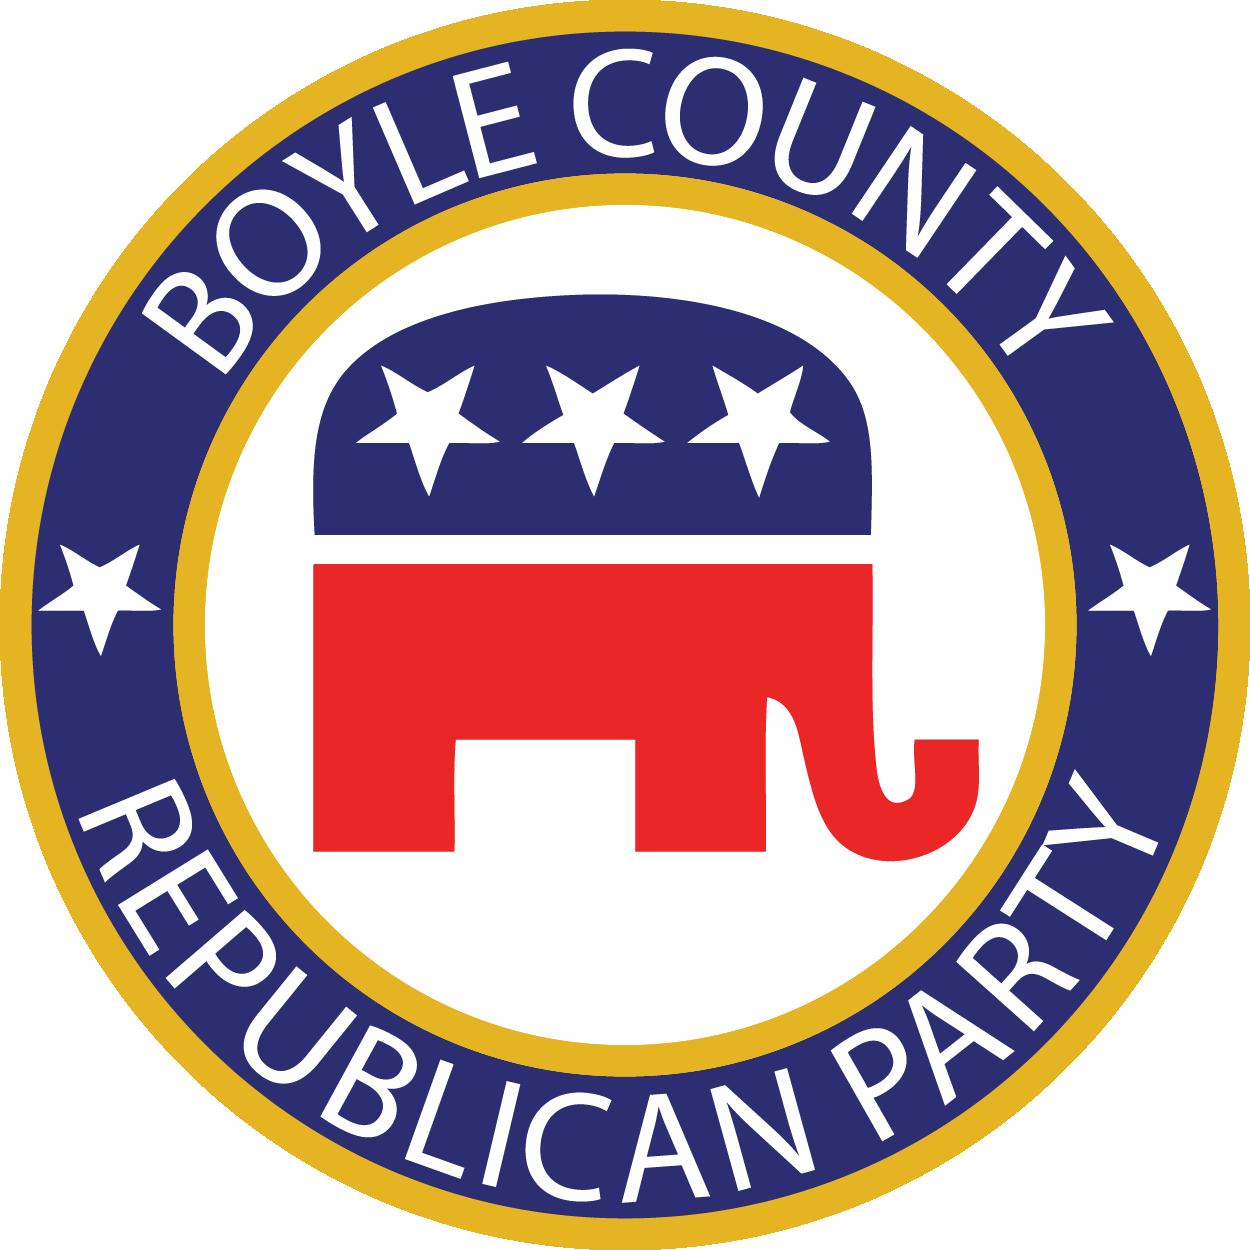 Boyle County KY GOP